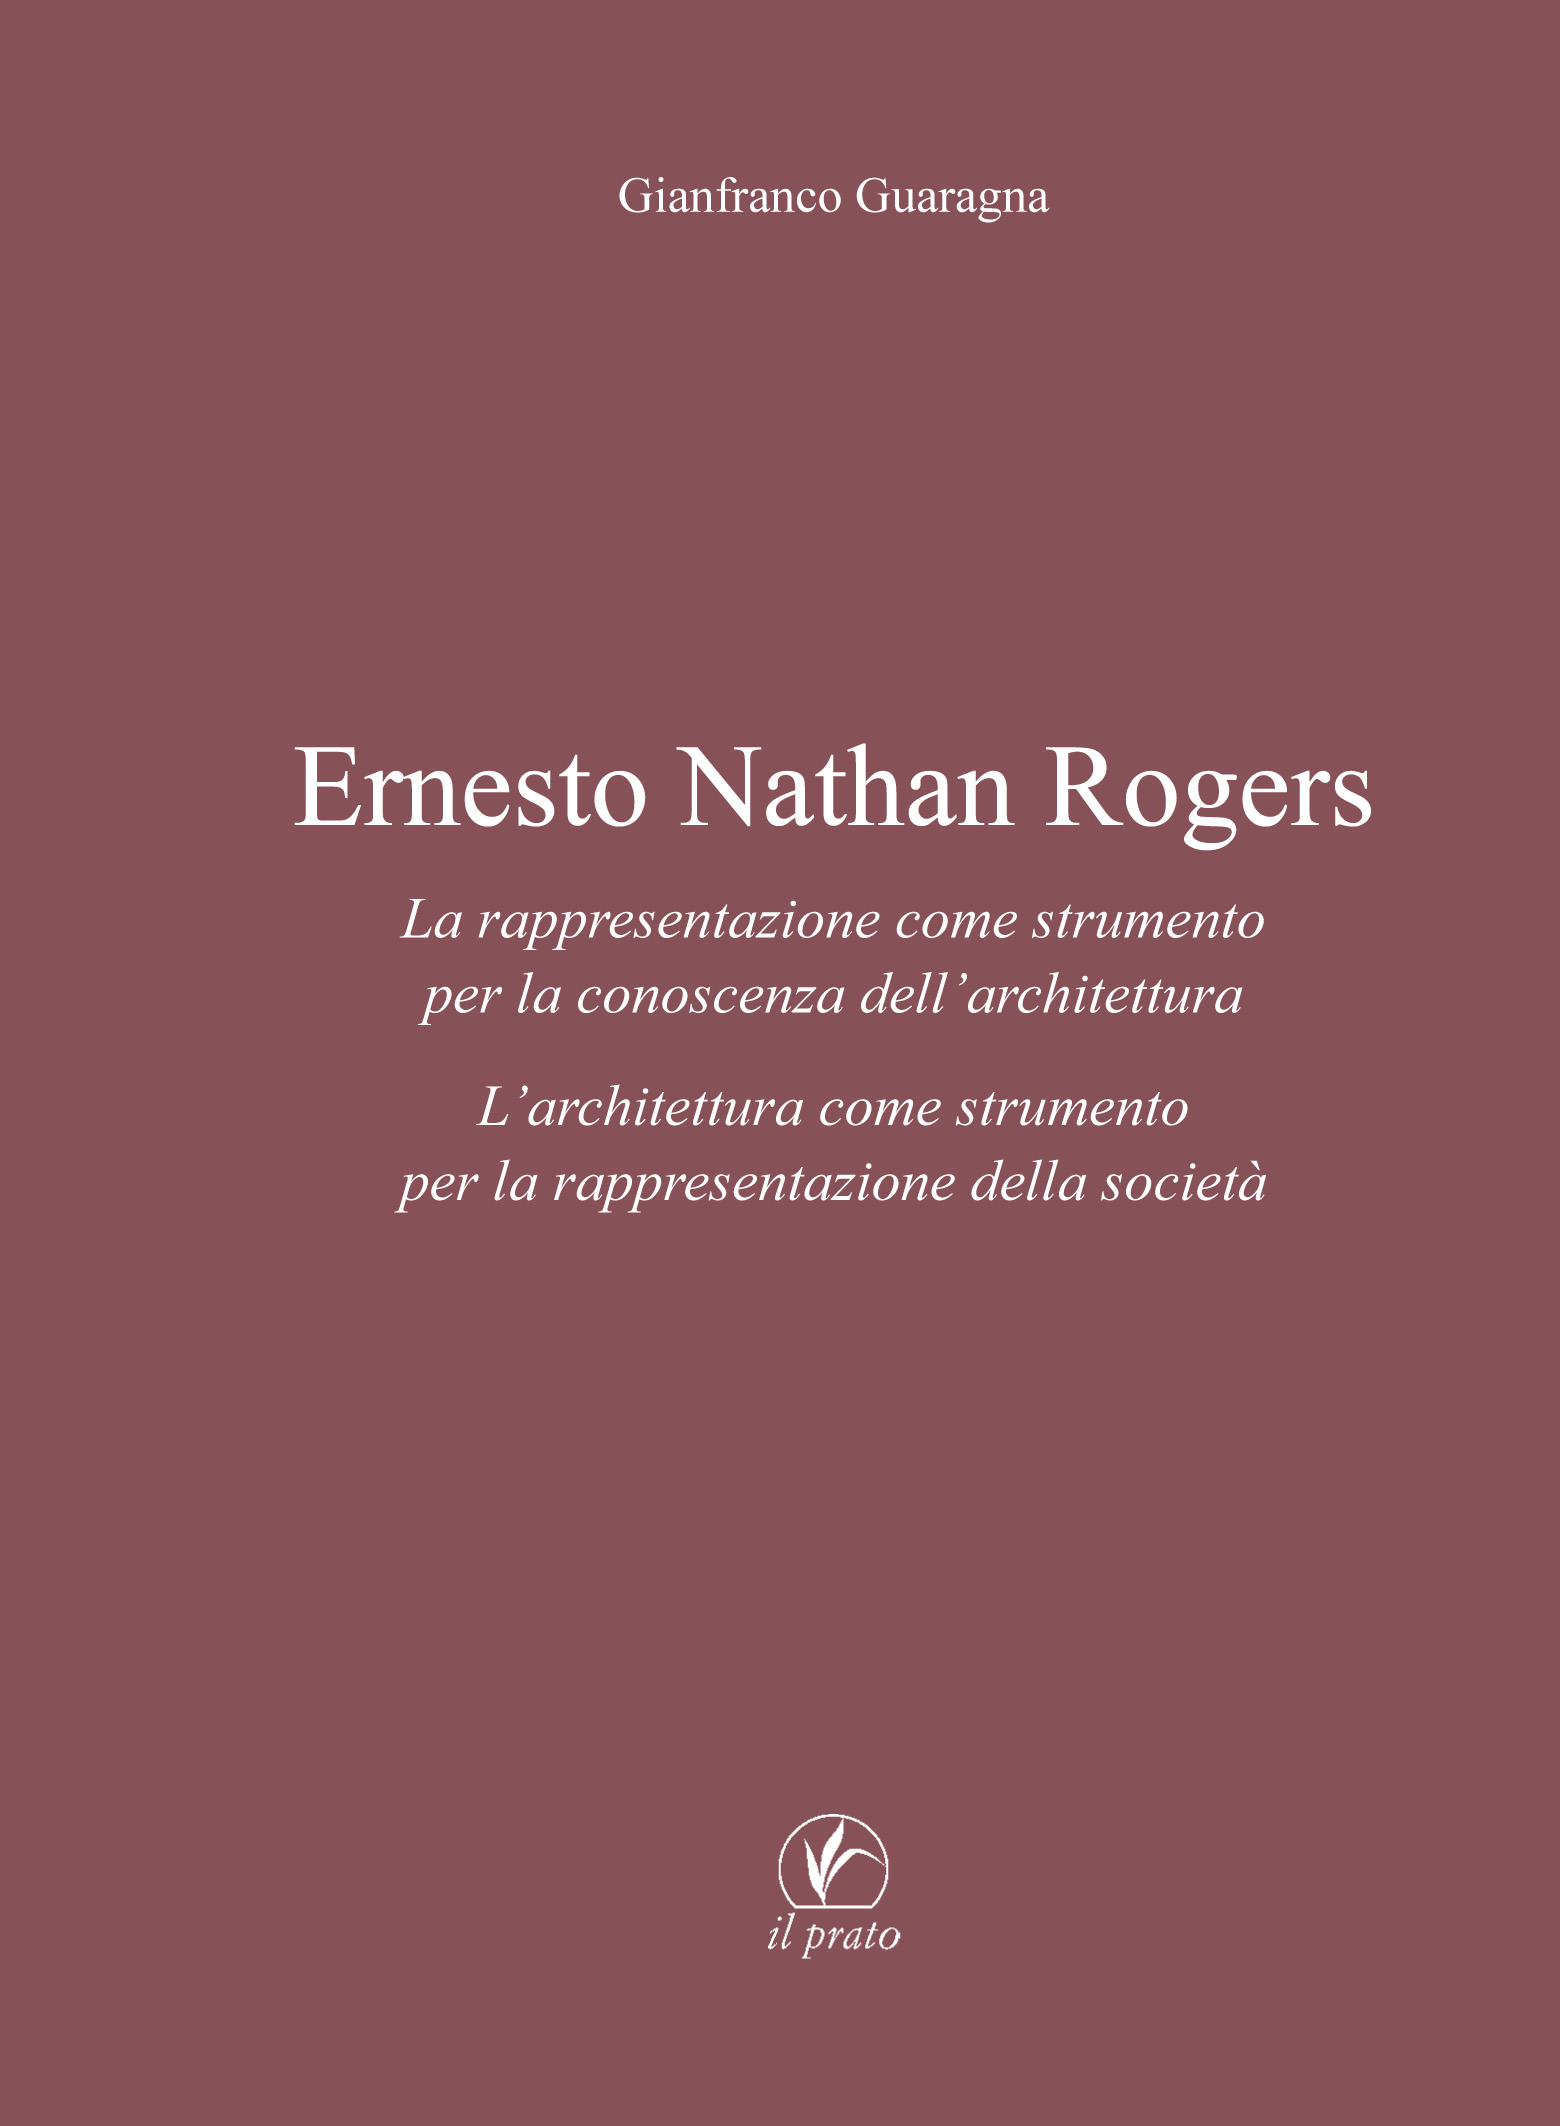 Gianfranco Guaragna Ernesto Nathan Rogers